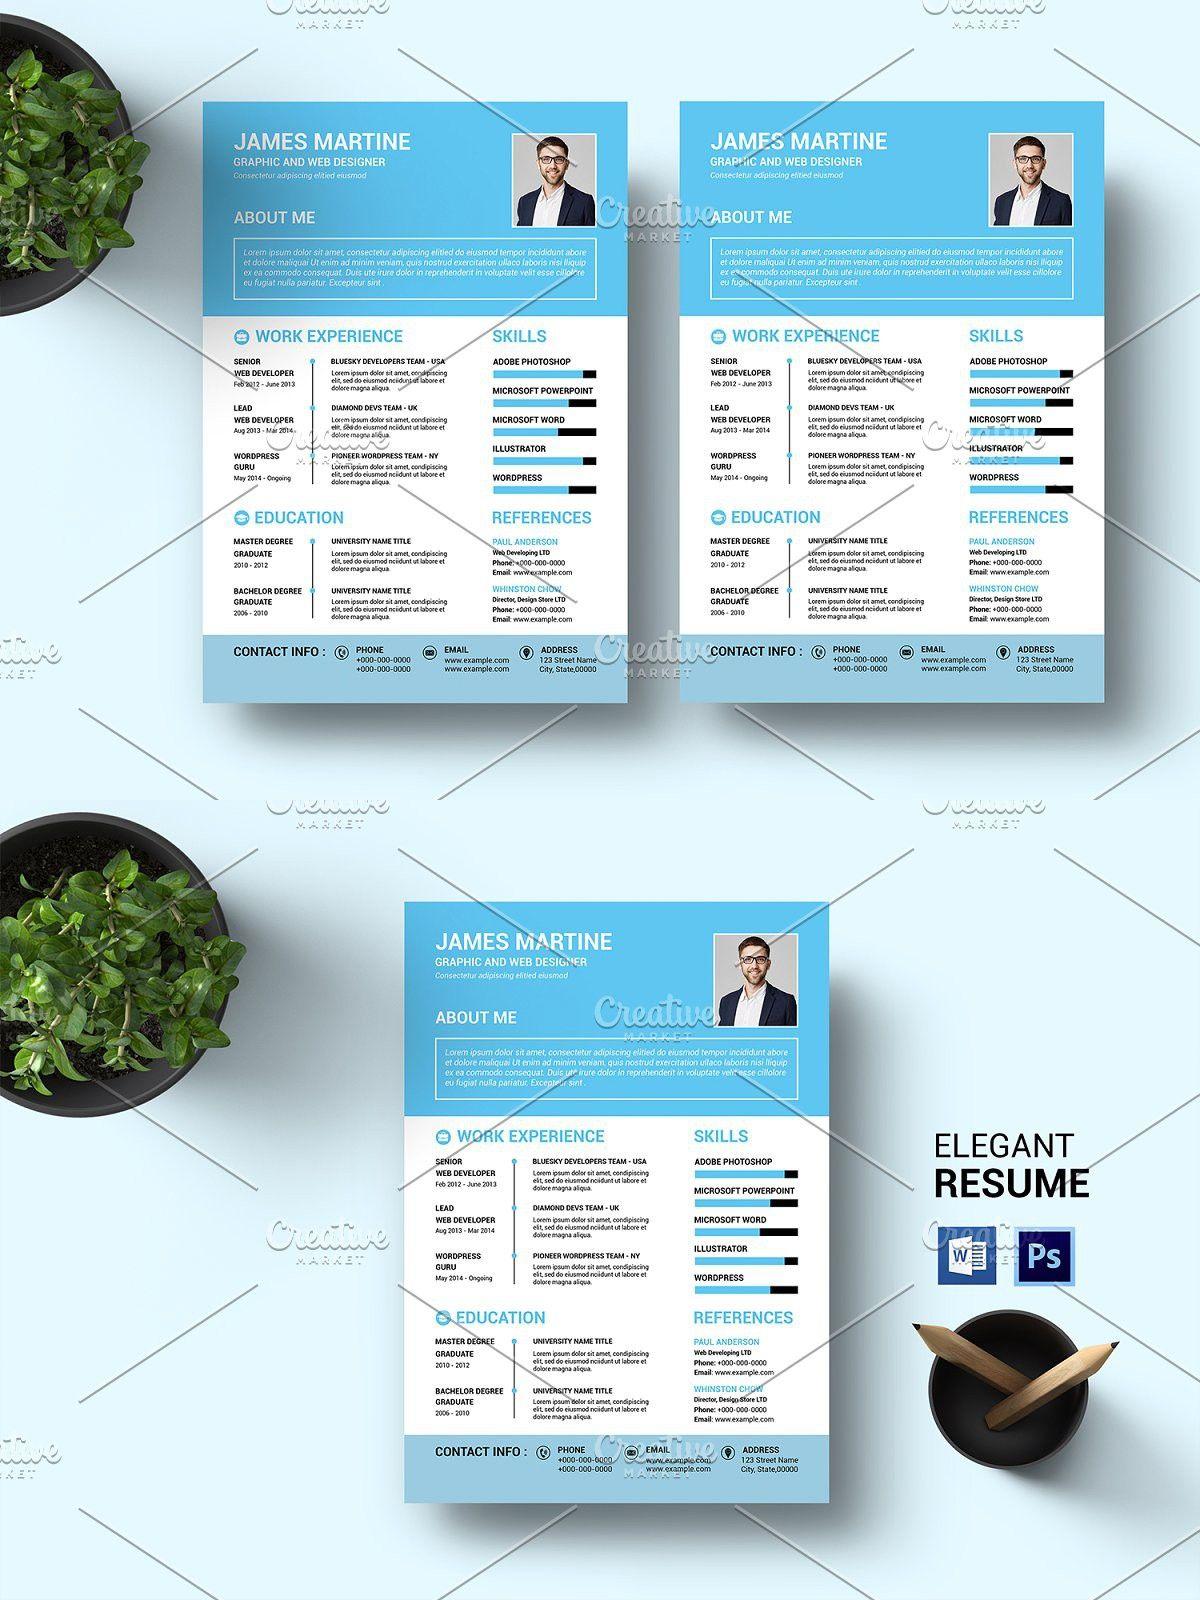 Clean Resume V48 Clean resume, Resume, Clean resume template